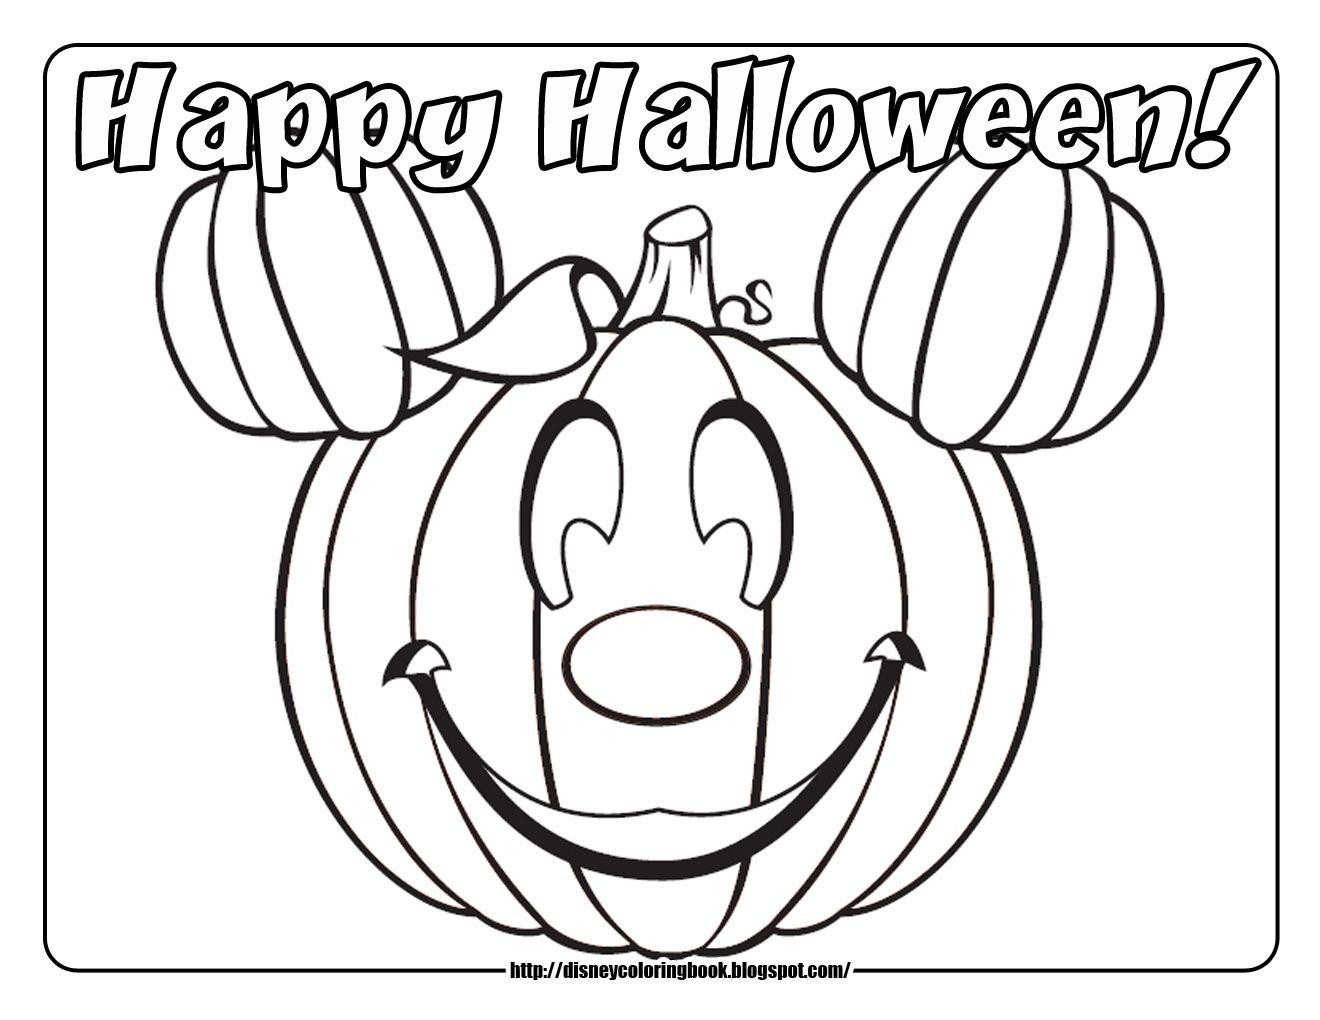 Halloween Coloring Pages Mickey PumpkinJPG 1320x1020 Pixels